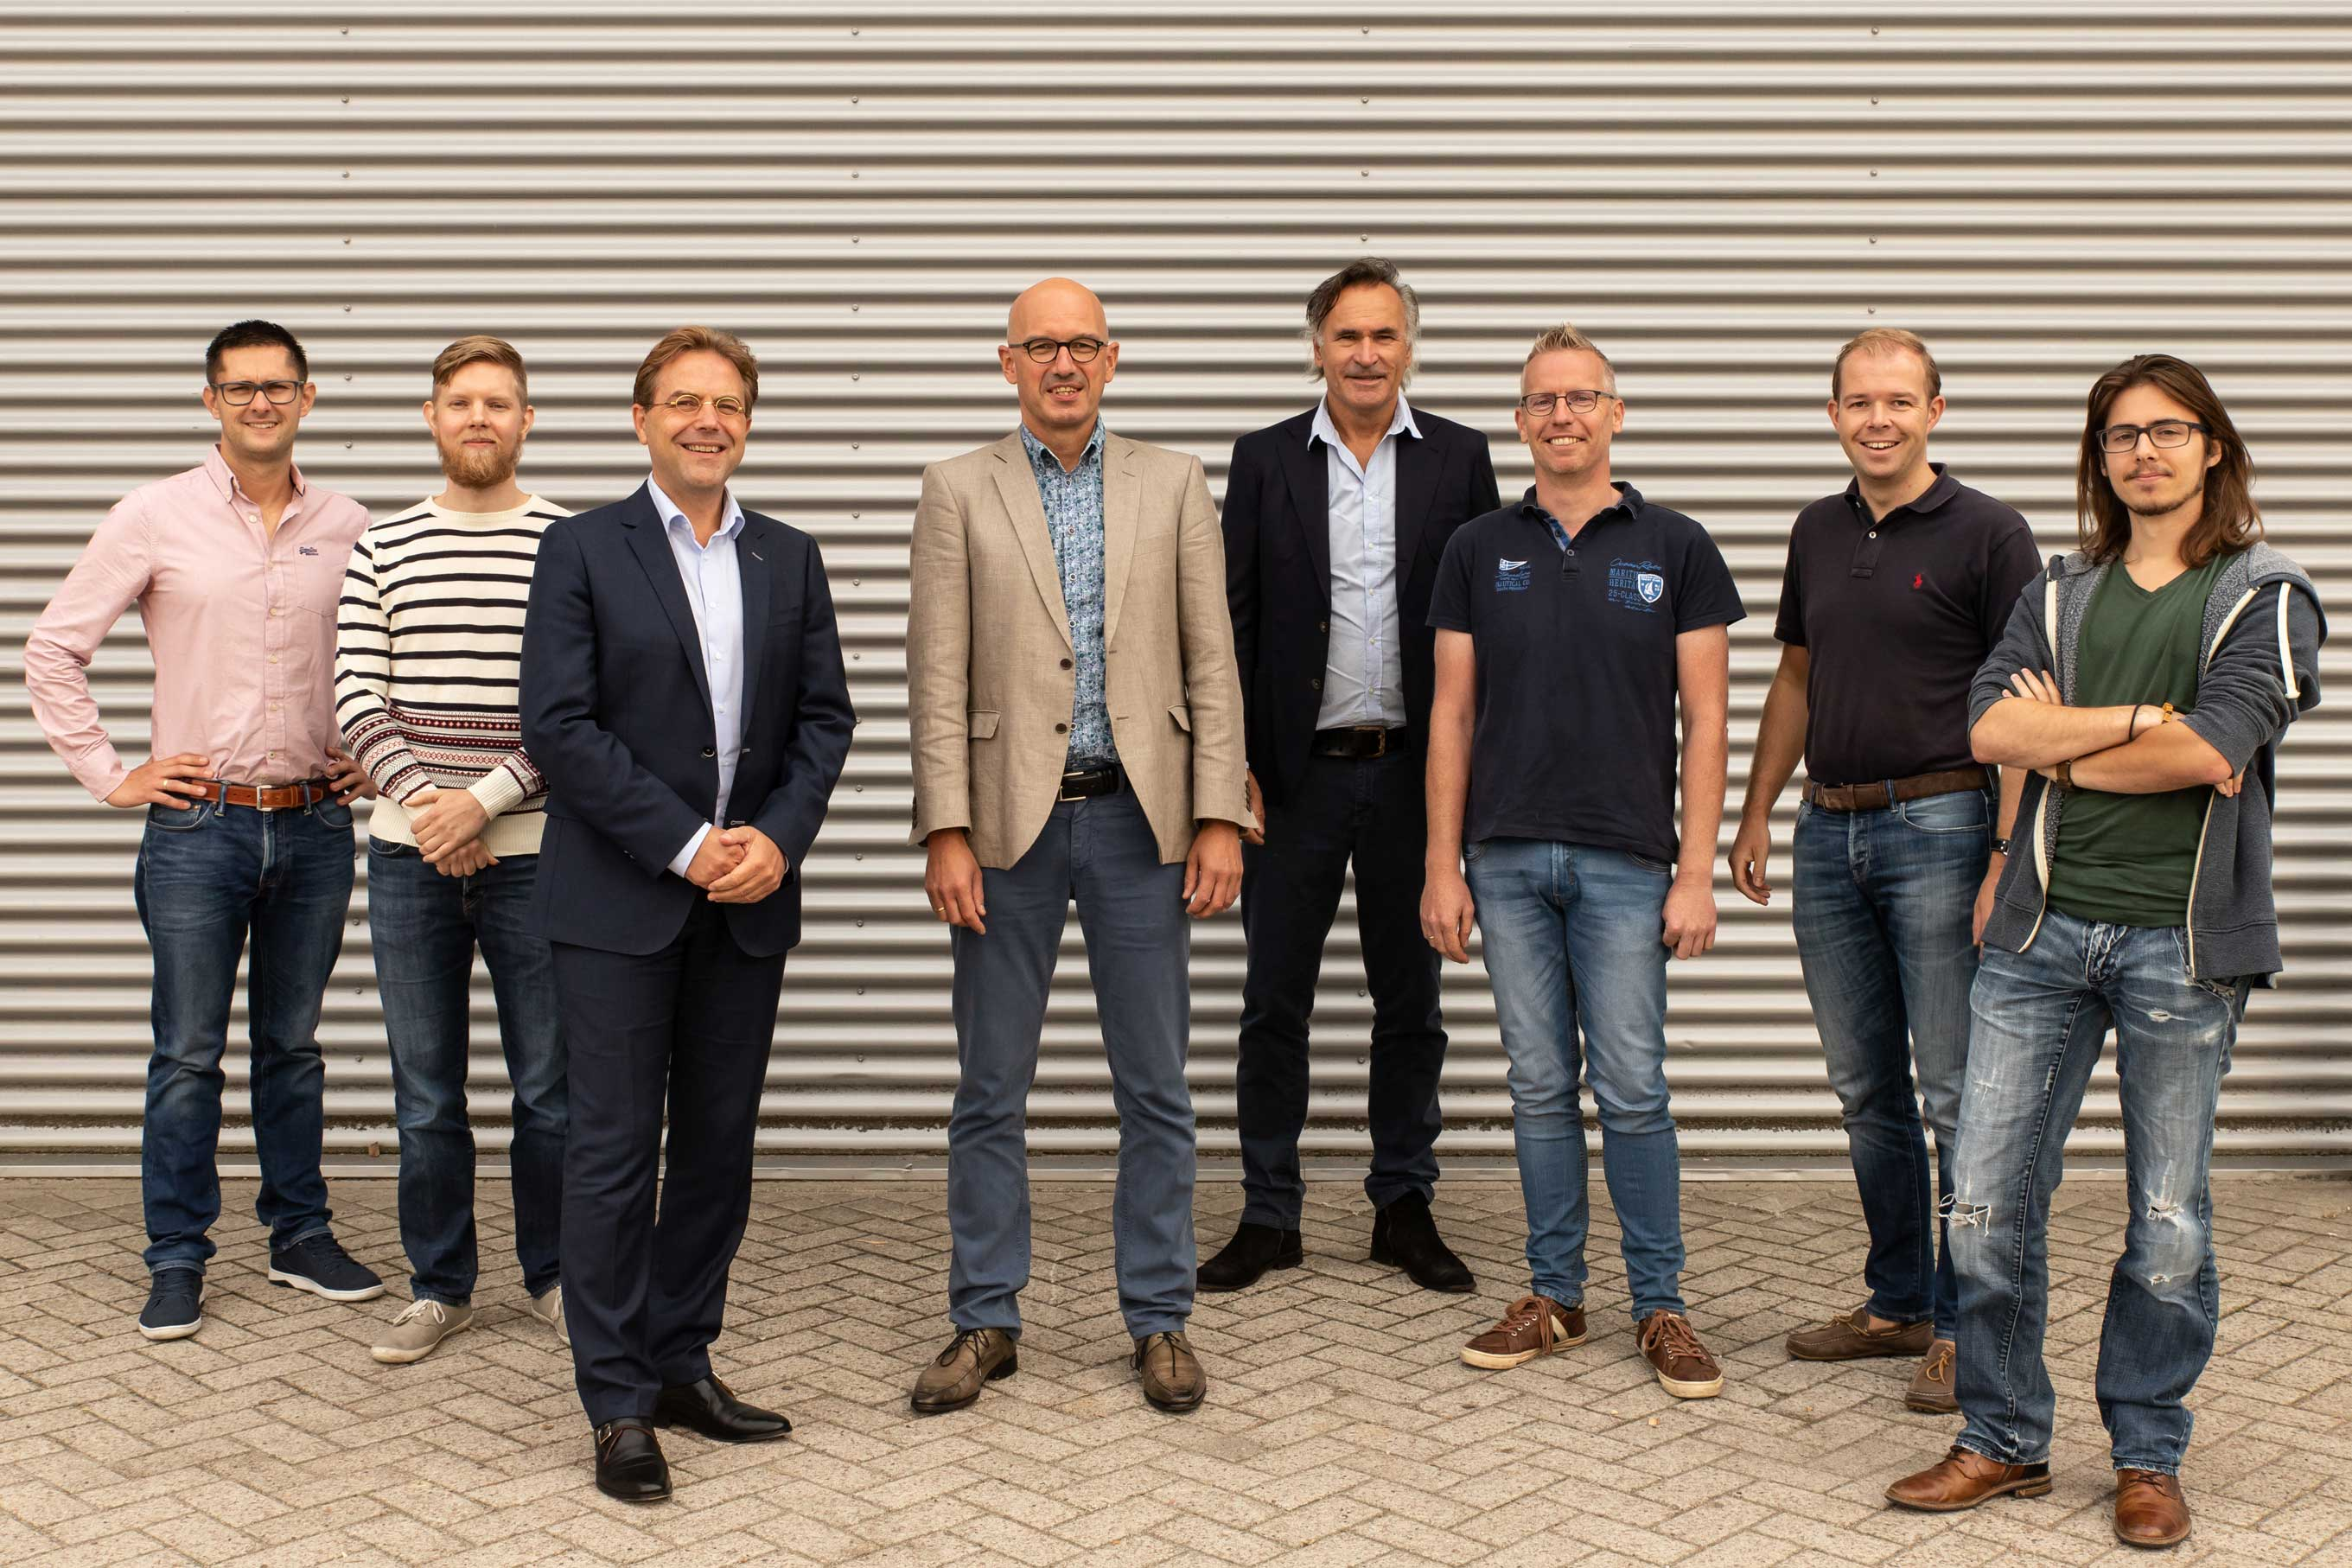 The innius team, Richard, Mark, John, Rine, Erik, Ron, Koos, Wolf